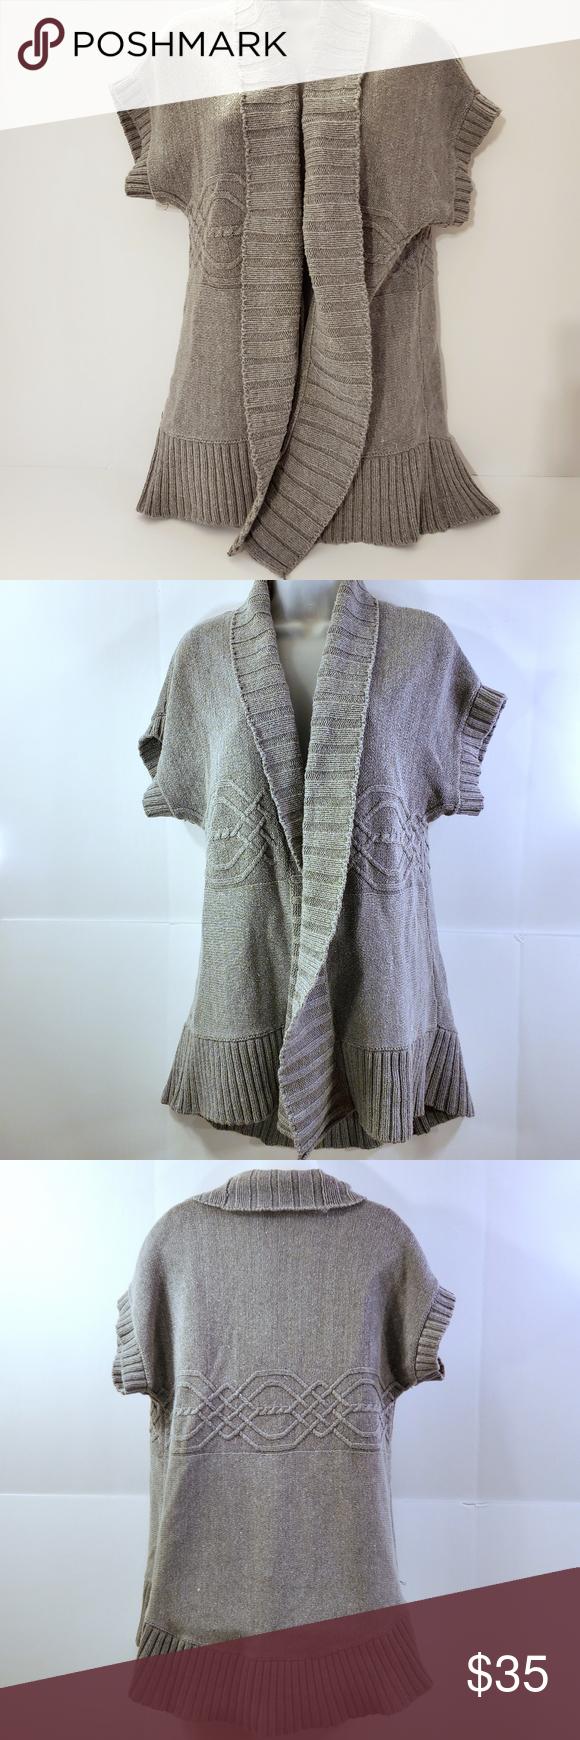 Donna Karen DKNY Open Cardigan Tunic Sweater Donna Karen DKNY Open Cardigan Tuni…